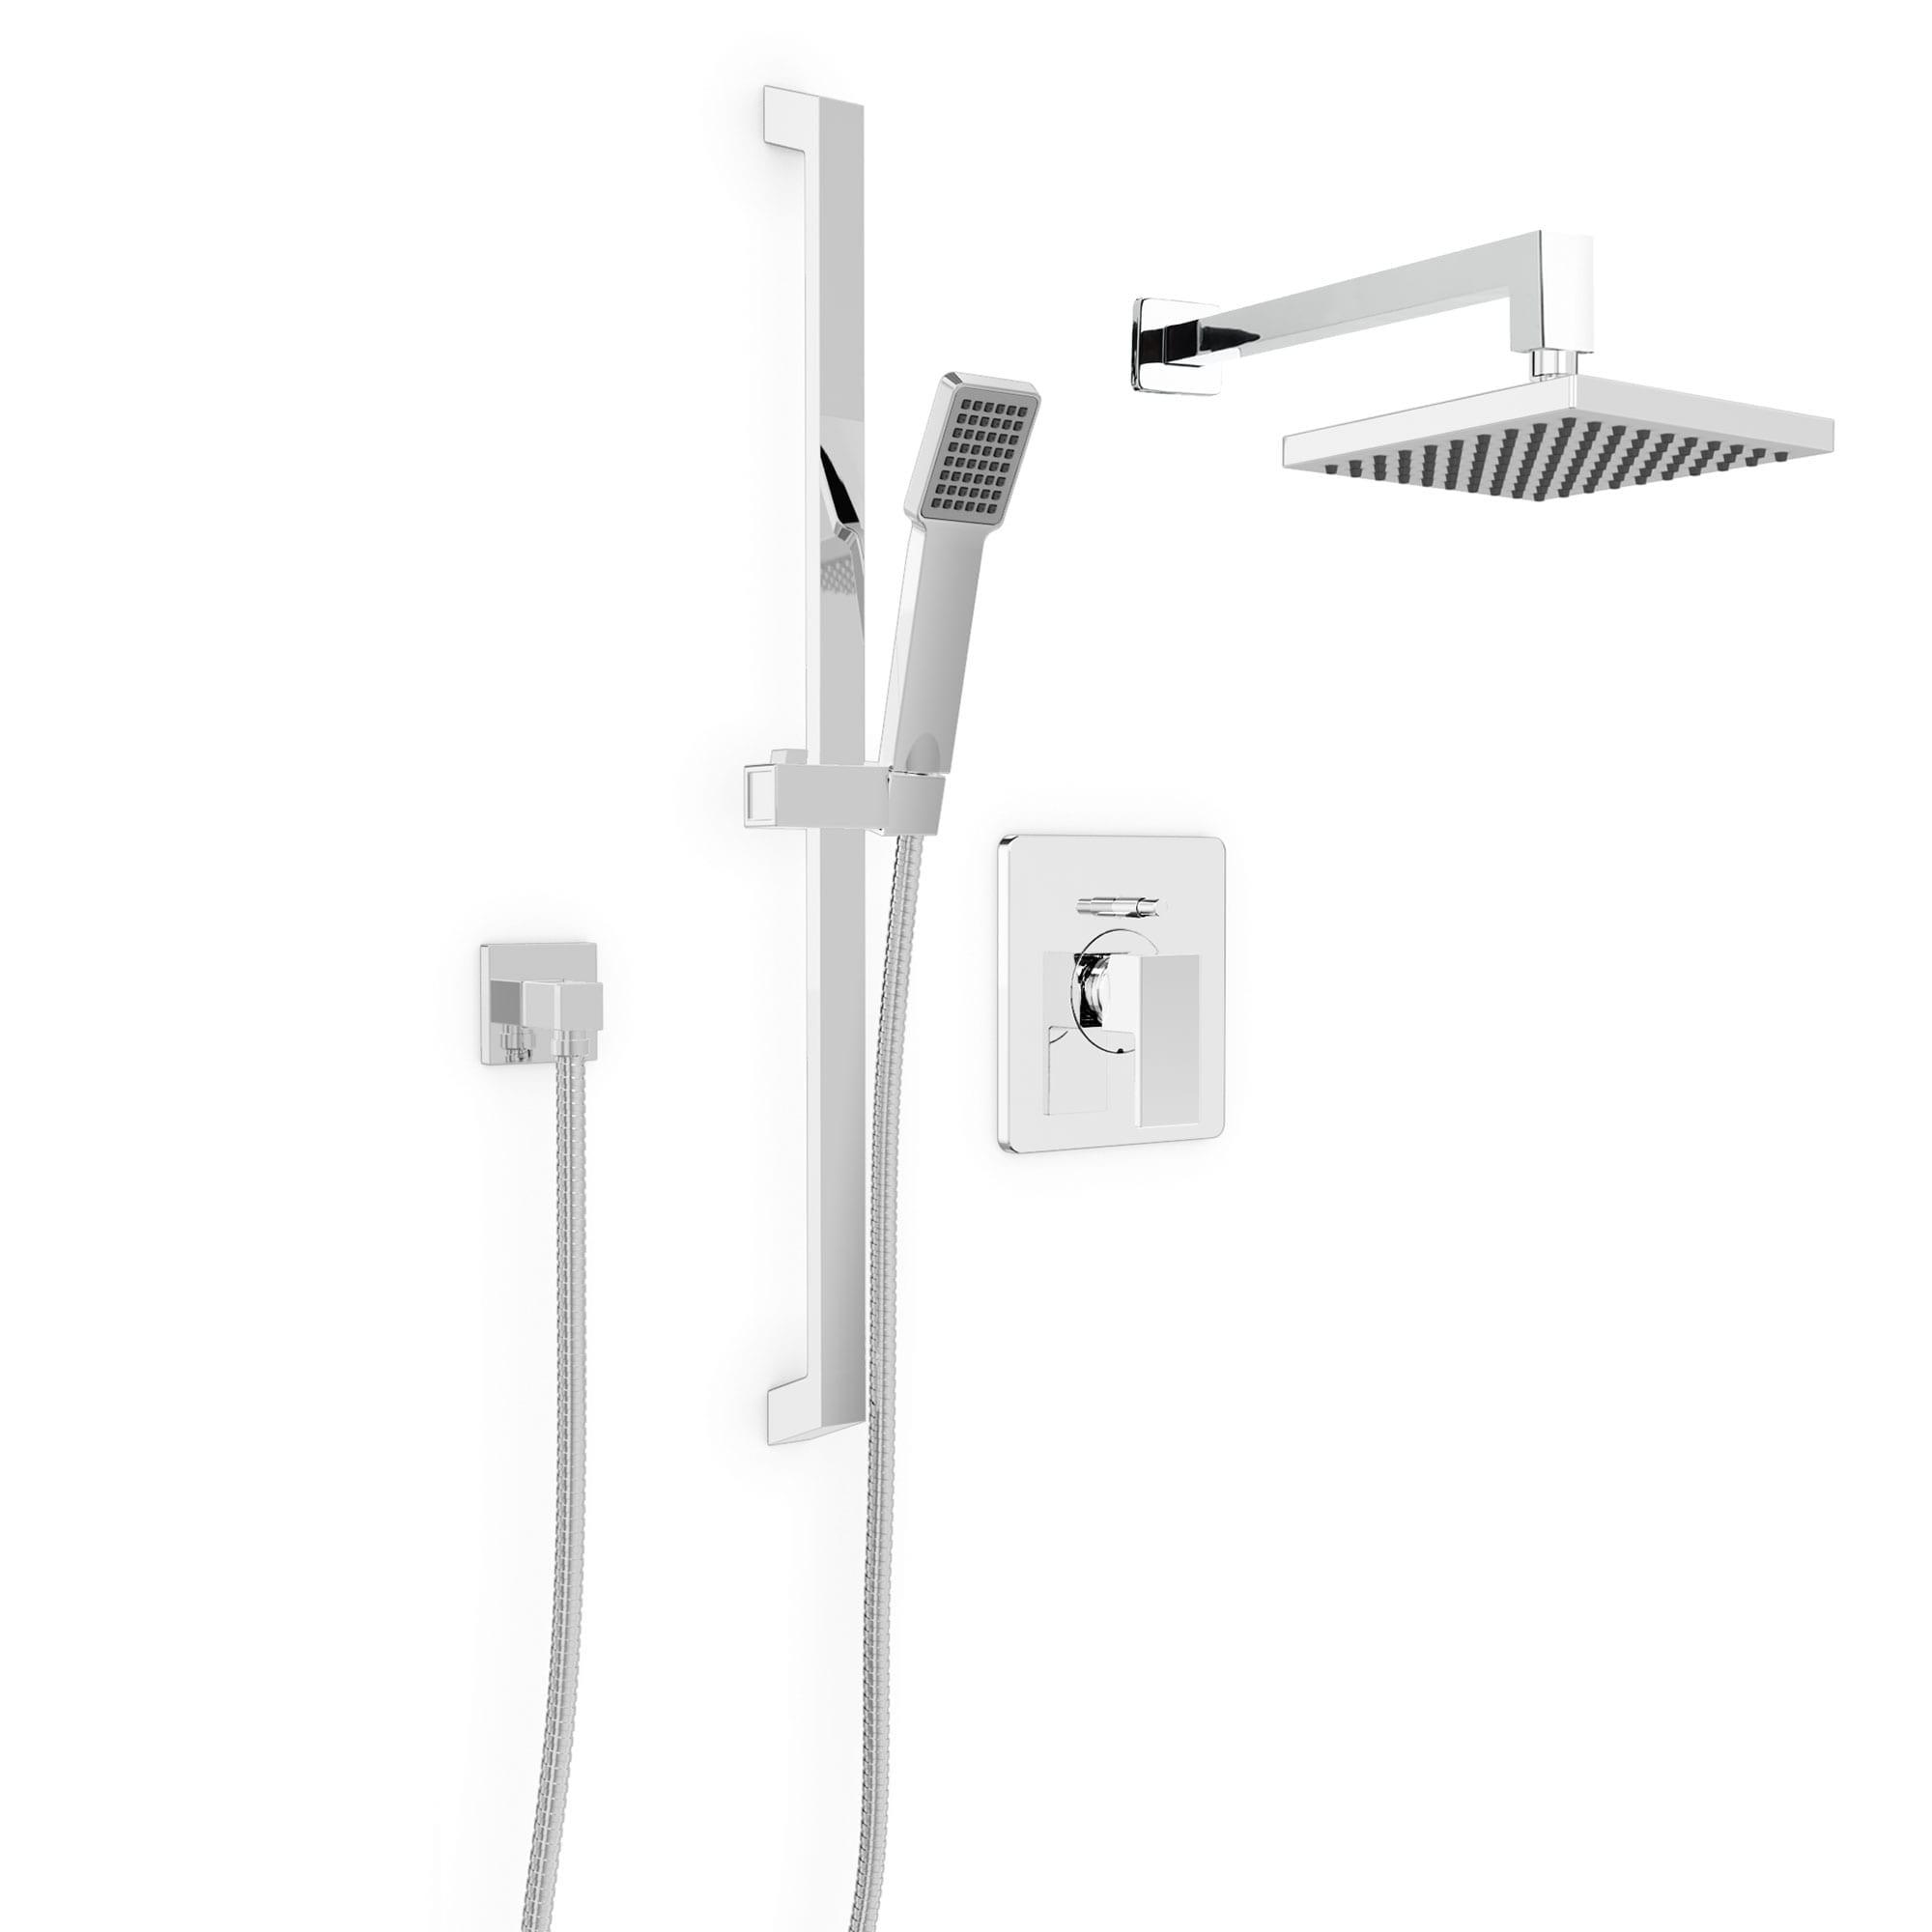 crane repair a applied home how valve shower to faucets bathtub bath brilliant your pertaining design tub faucet problems diverter